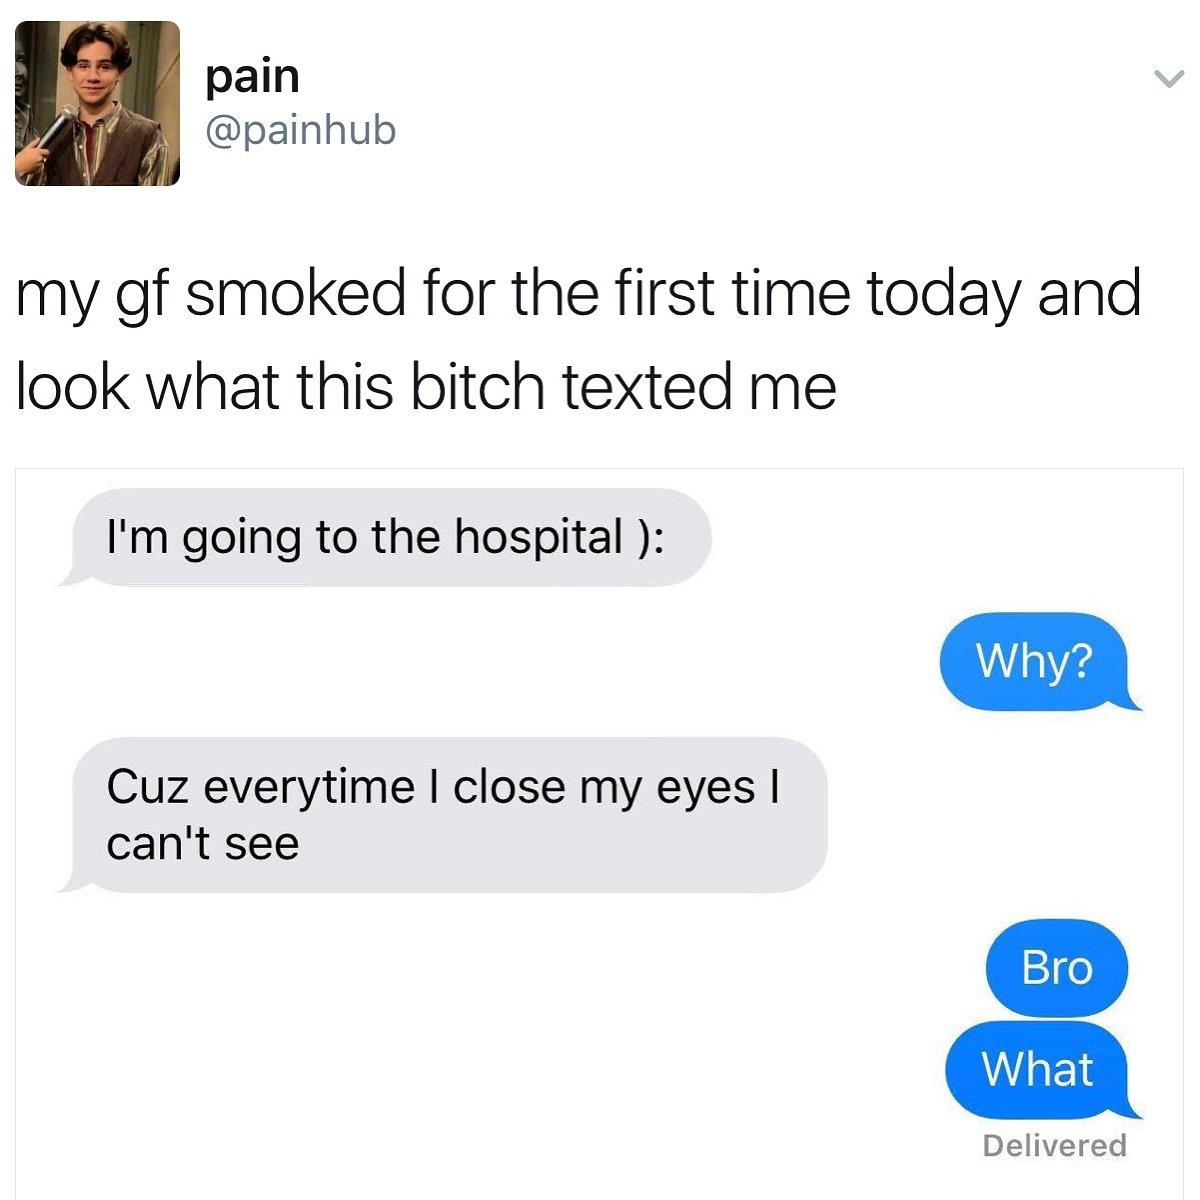 Bro, what?